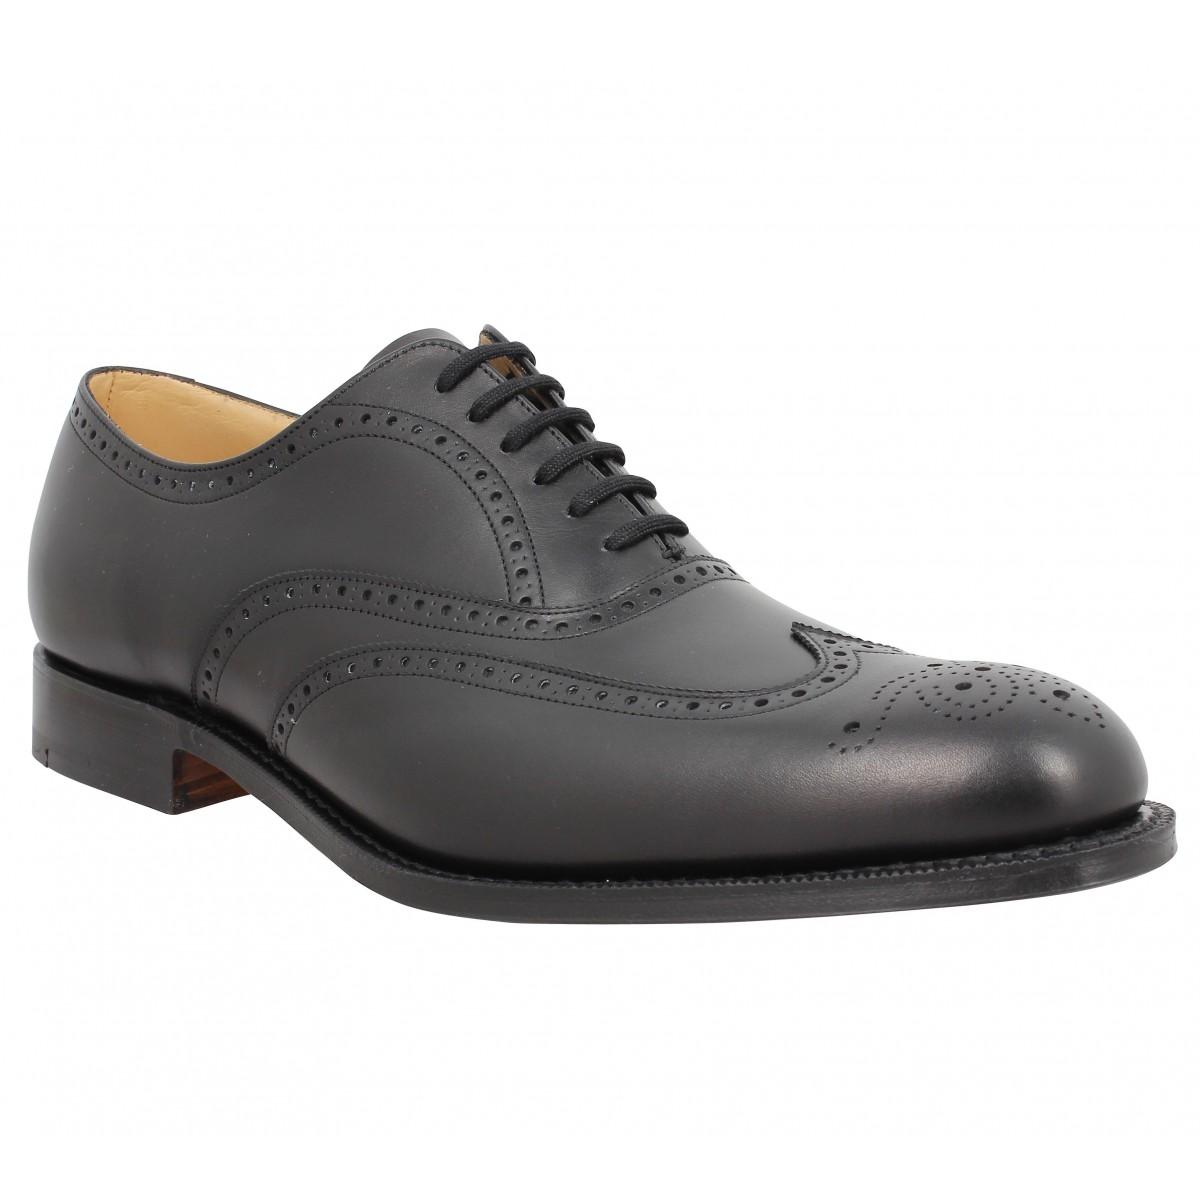 Chaussures à lacets CHURCH'S Berlin cuir Noir